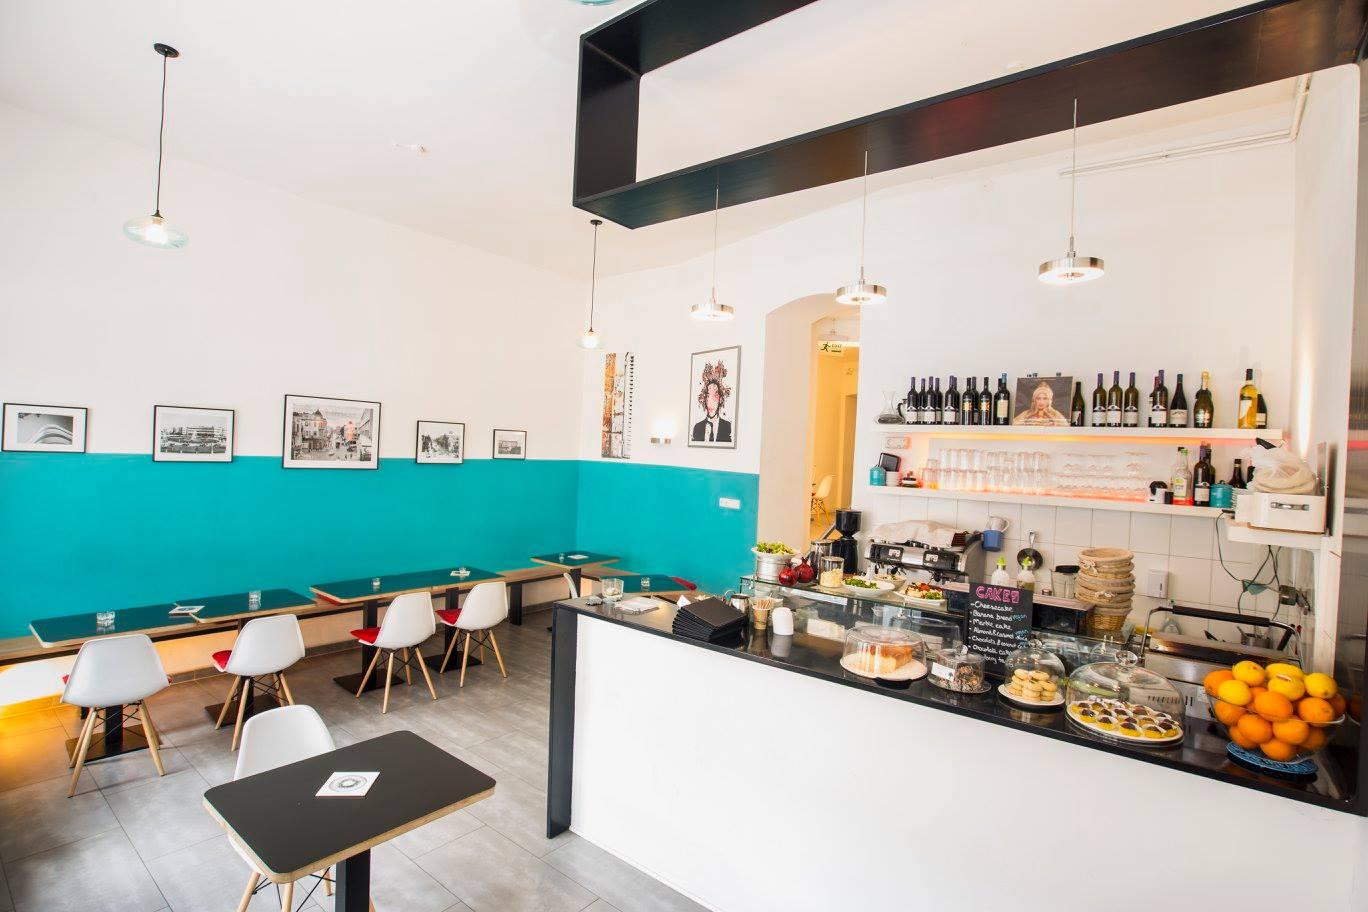 Shiloh Cafe Bistro